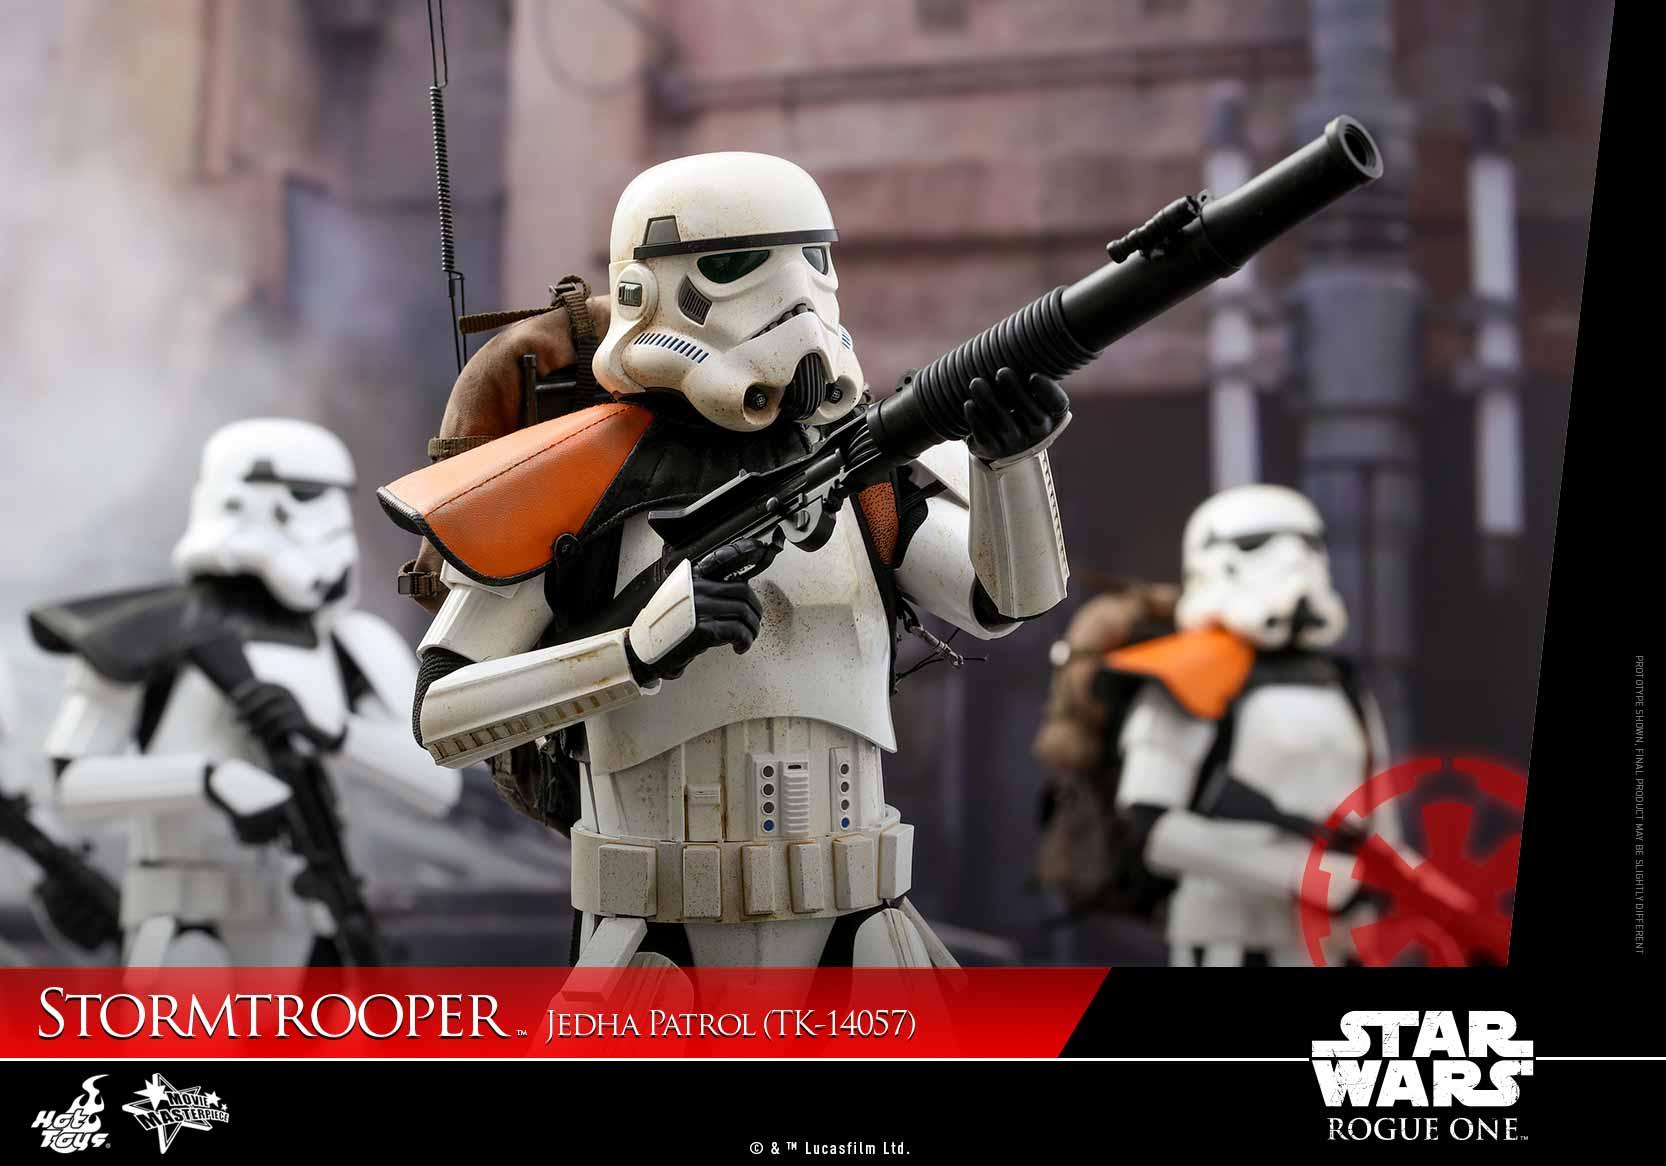 hot-toys-swro-stormtrooper-jedha-patrol-tk-14057-collectible-figure_pr4